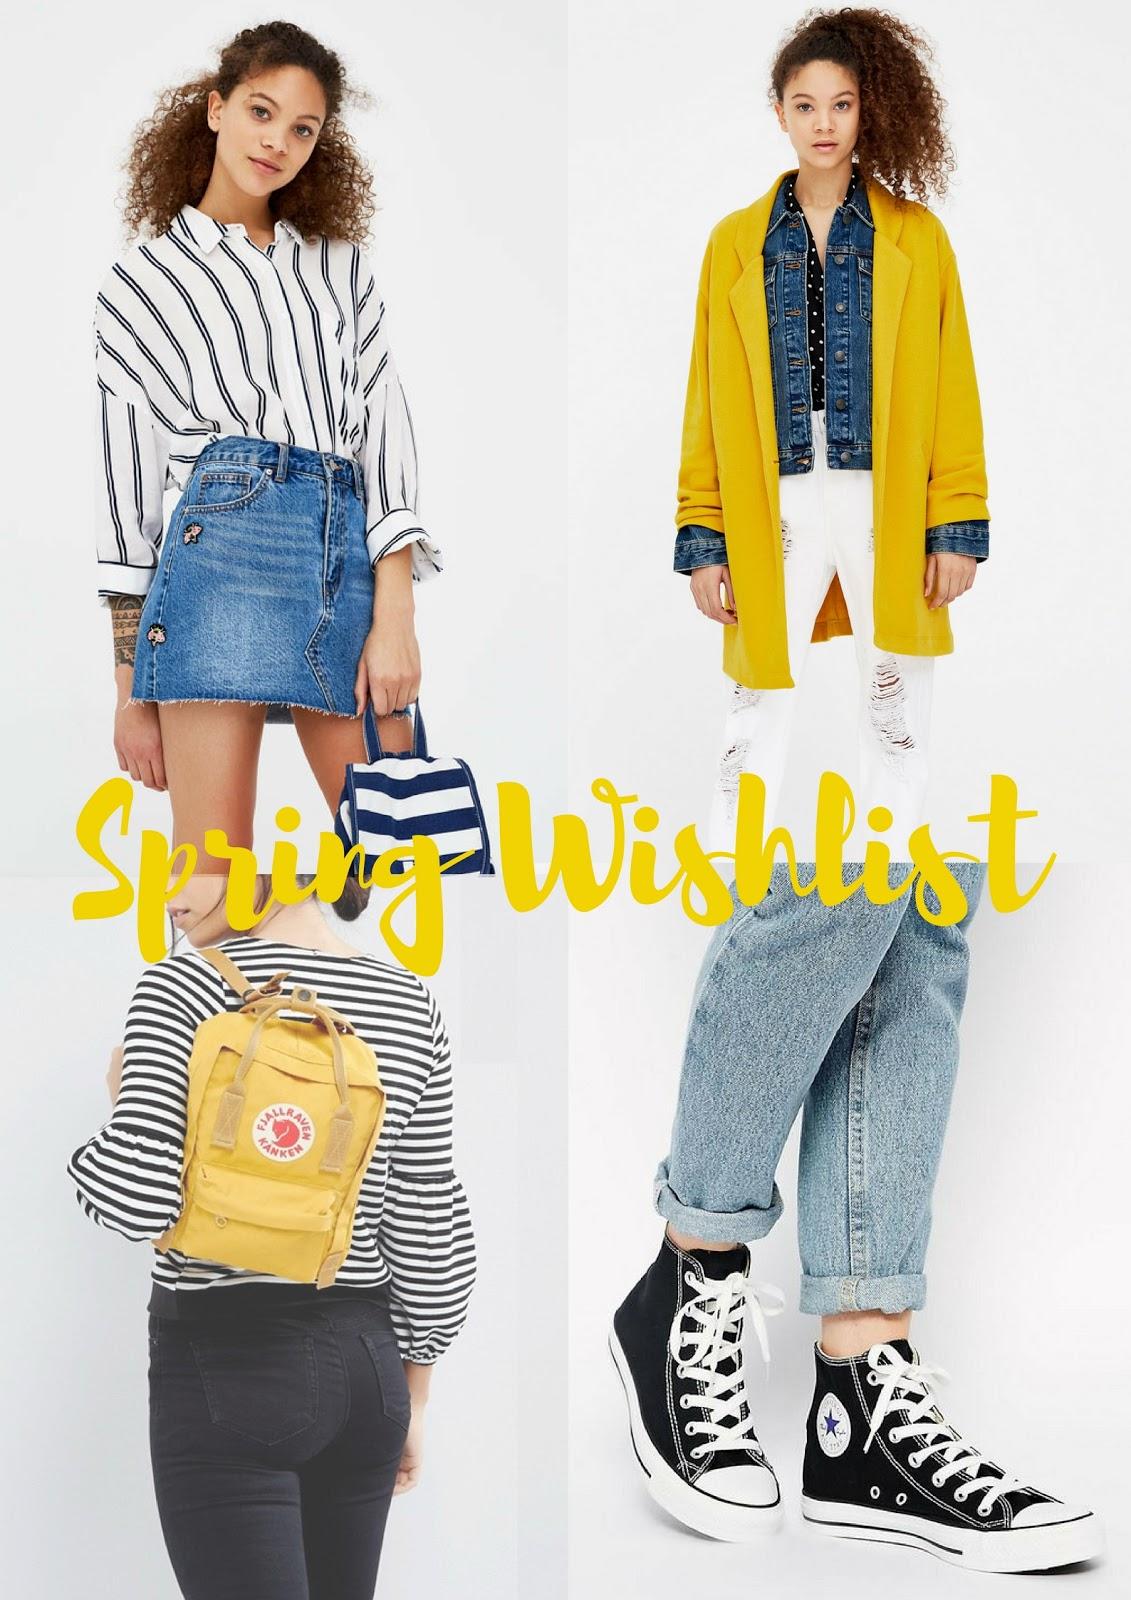 francisca rockey, lifestyle blogger, fitness blogger, beauty blogger, small blogger, spring, spring wishlist